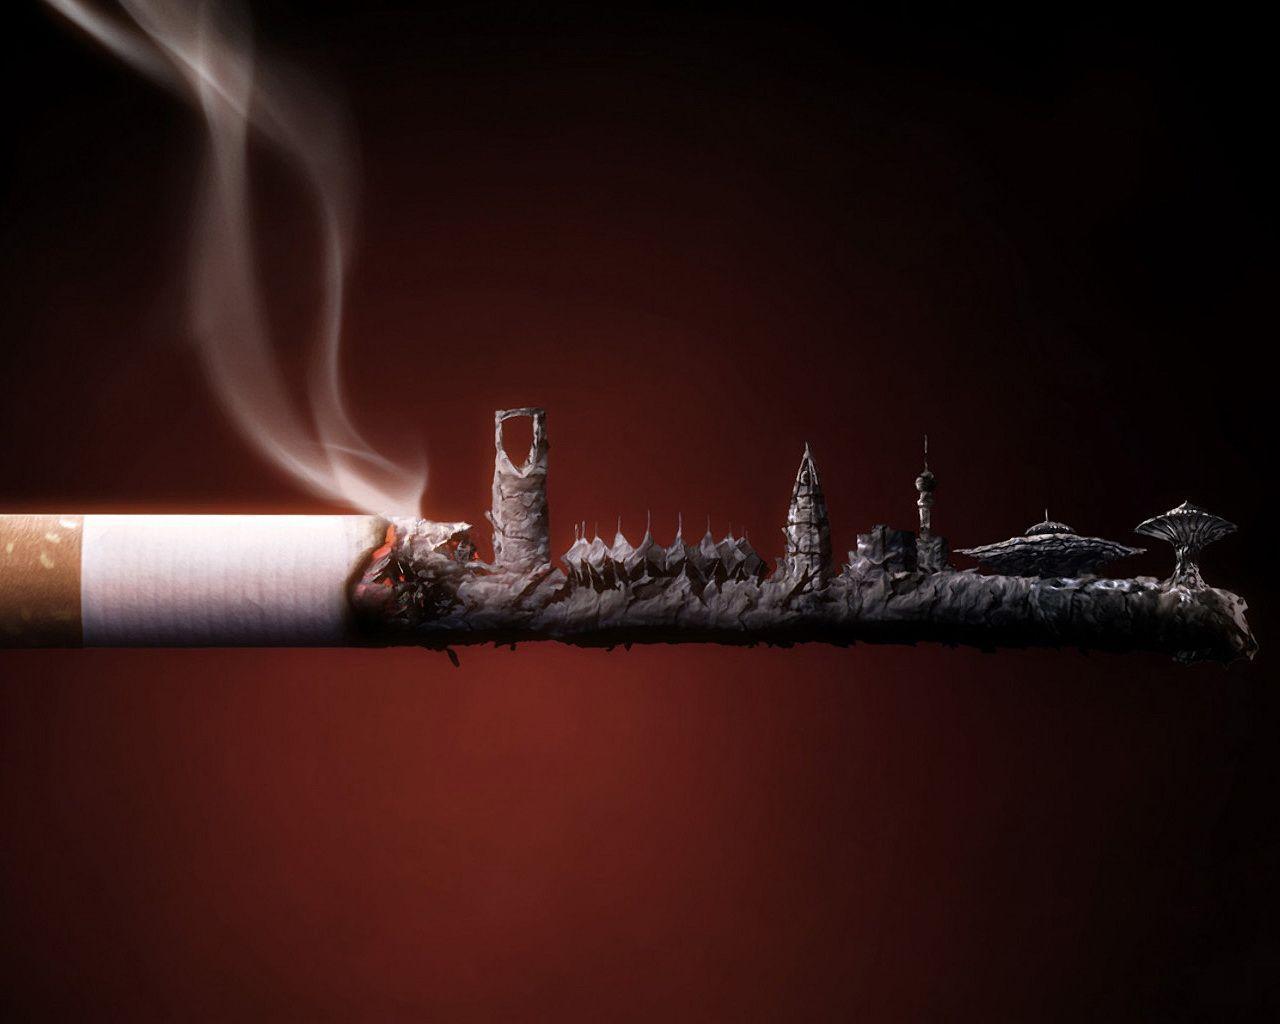 Smoking Desktop Wallpapers Top Free Smoking Desktop Backgrounds Wallpaperaccess